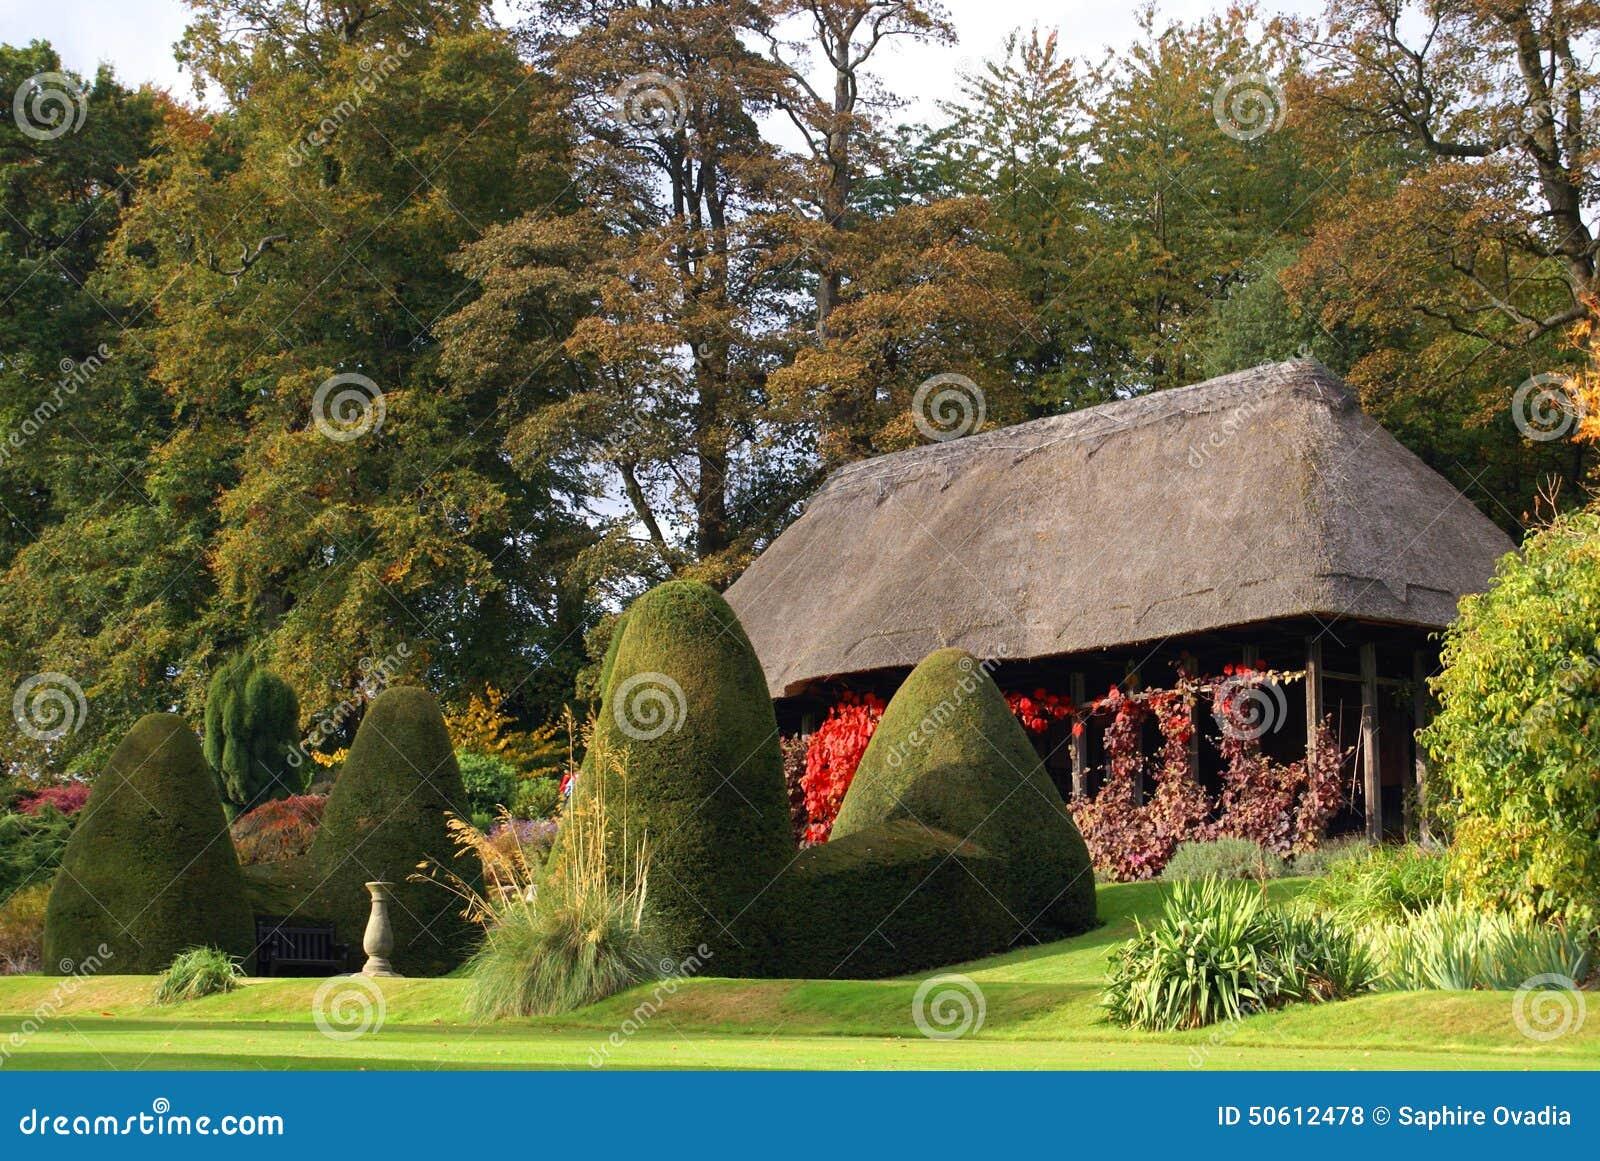 Chirk Castle Garden, Chirk, Wrexham, Wales, England Stock Photo ...